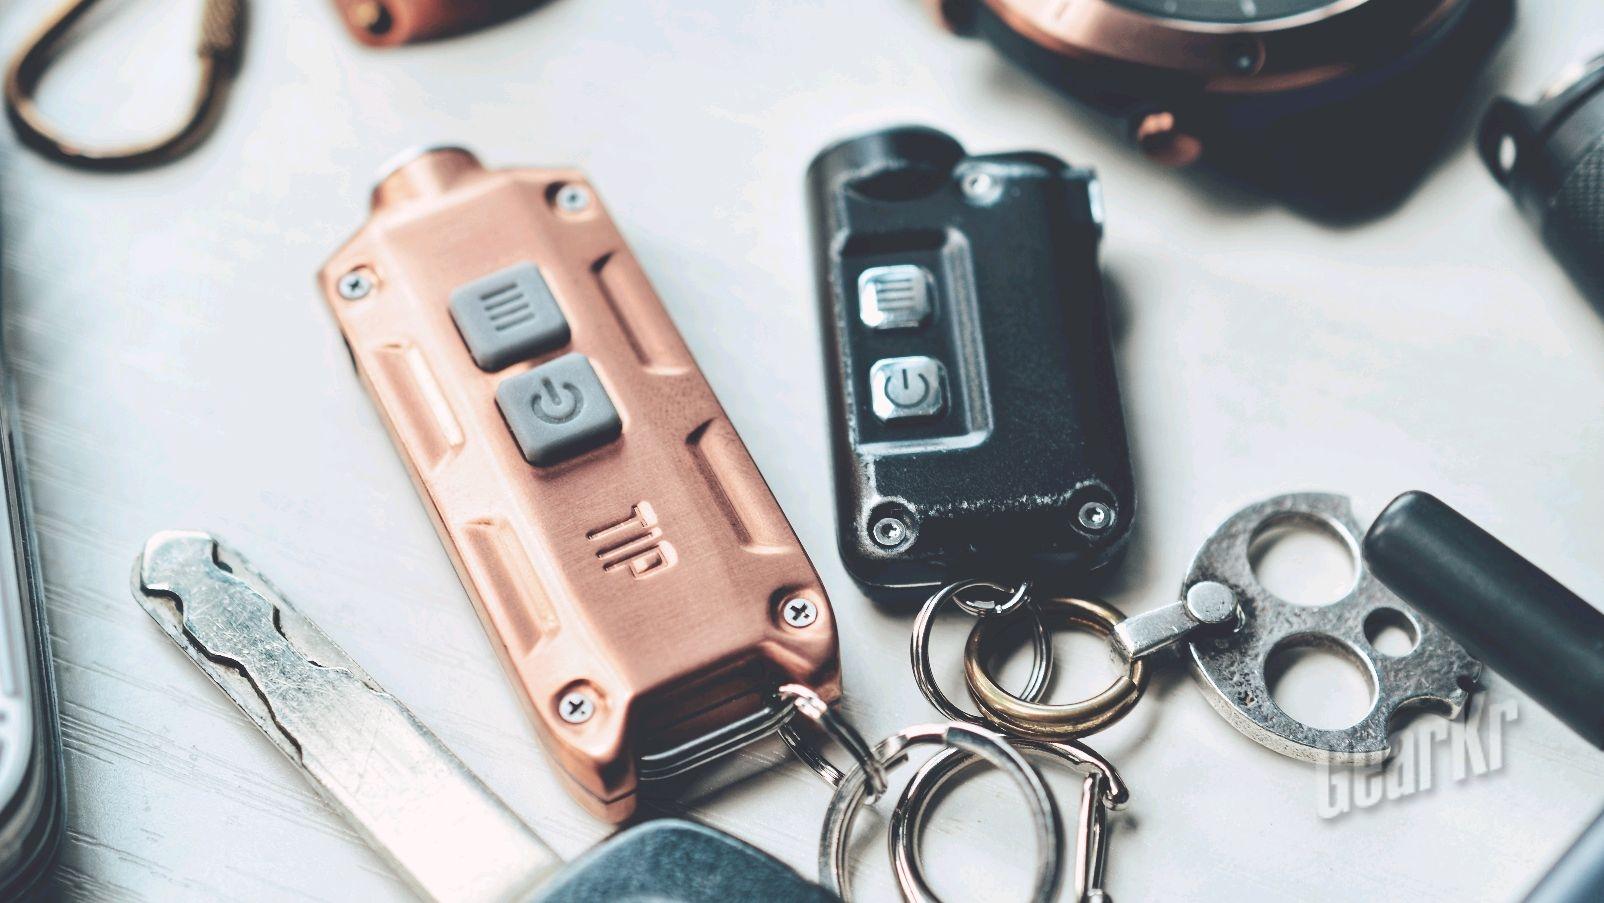 NITECORE TIP 红铜版,可以玩出逼格的钥匙扣手电